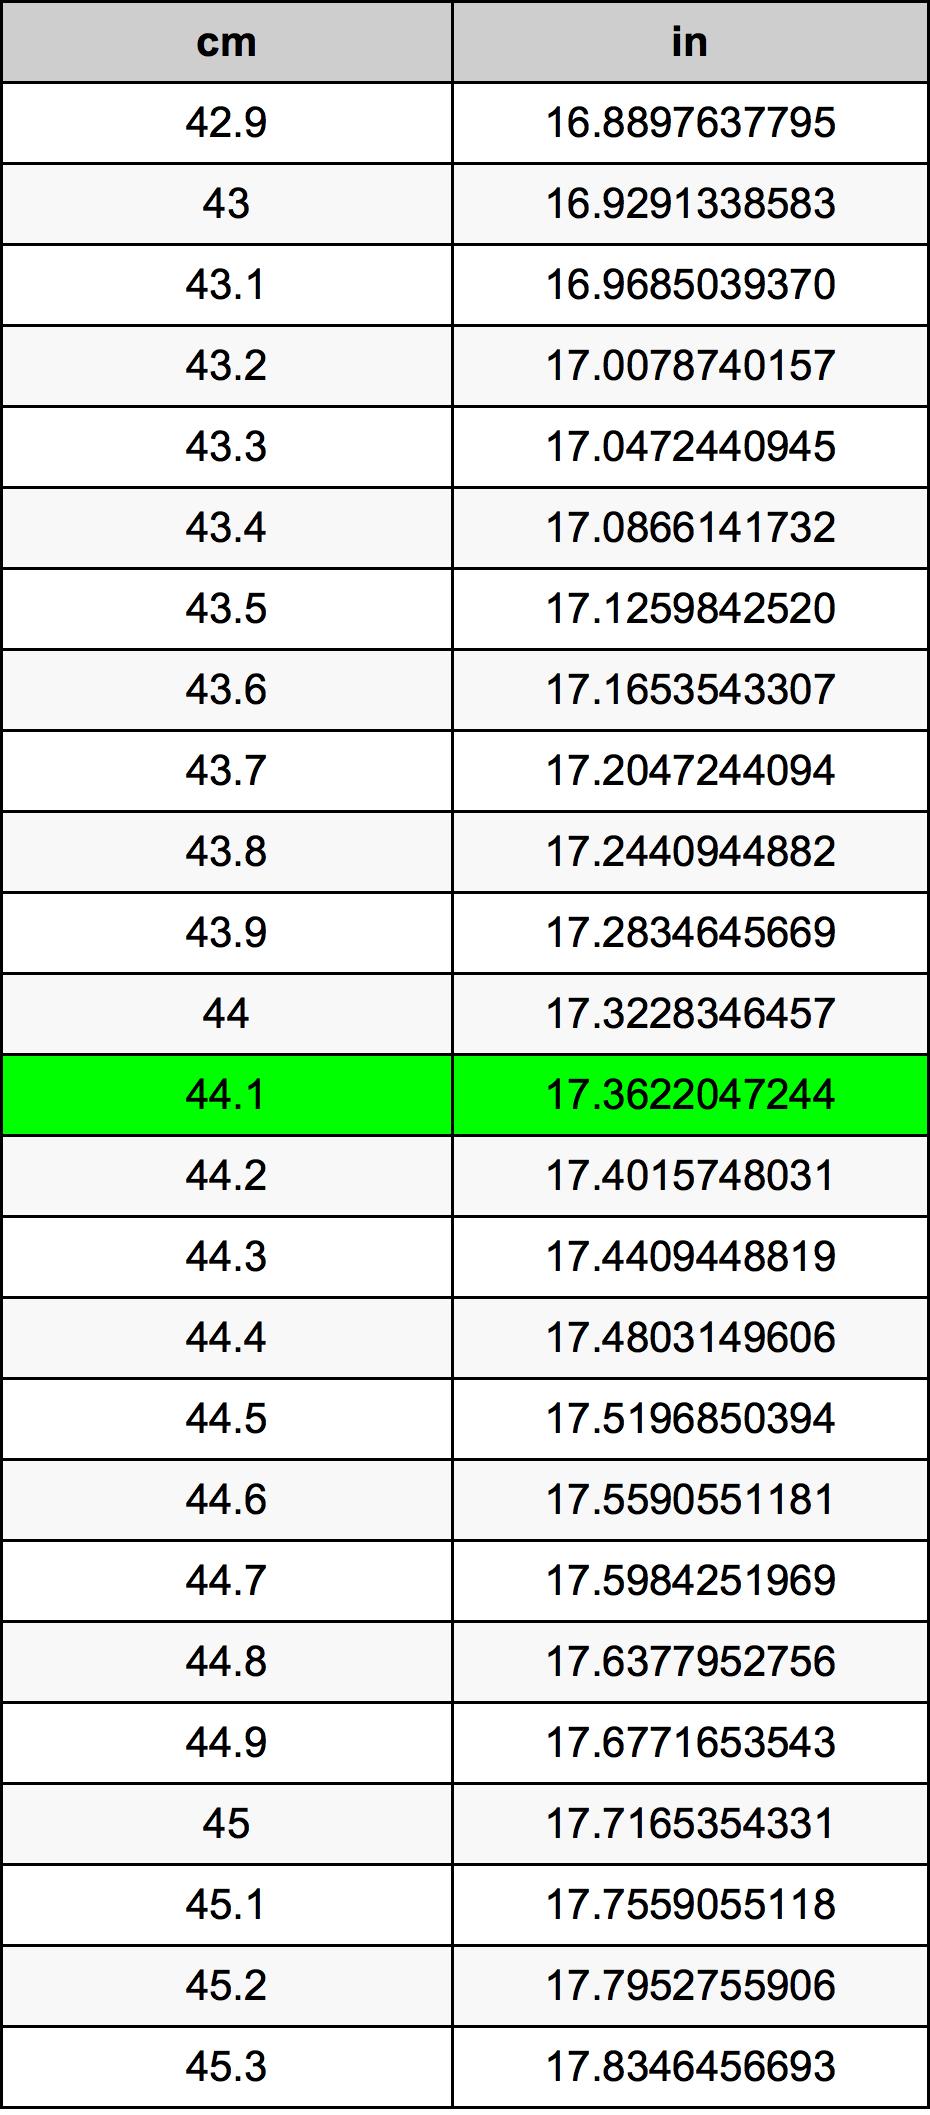 44.1 Centimeter konverteringstabellen